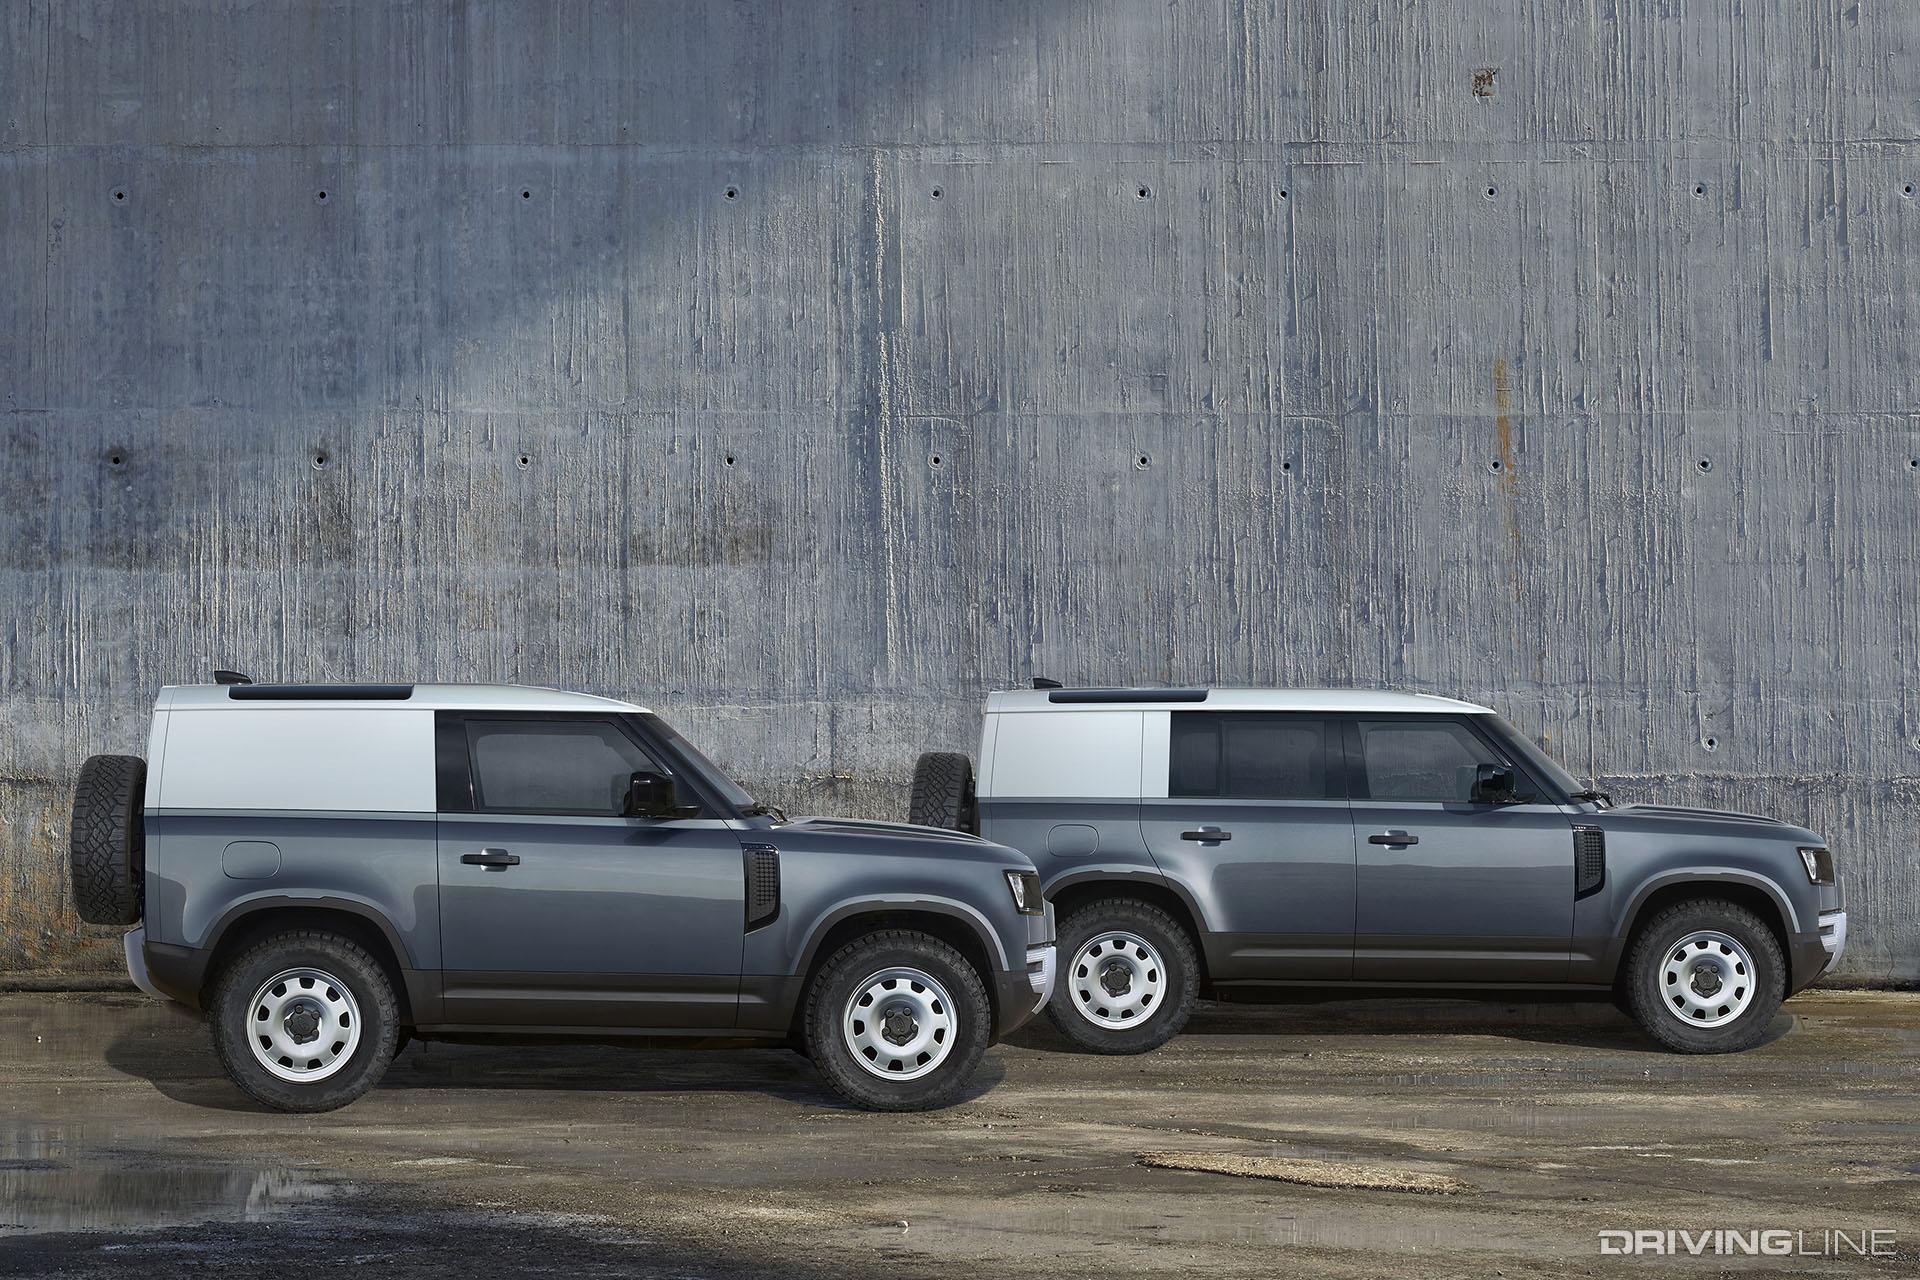 Retro-Styled 2020 Land Rover Defender | DrivingLine